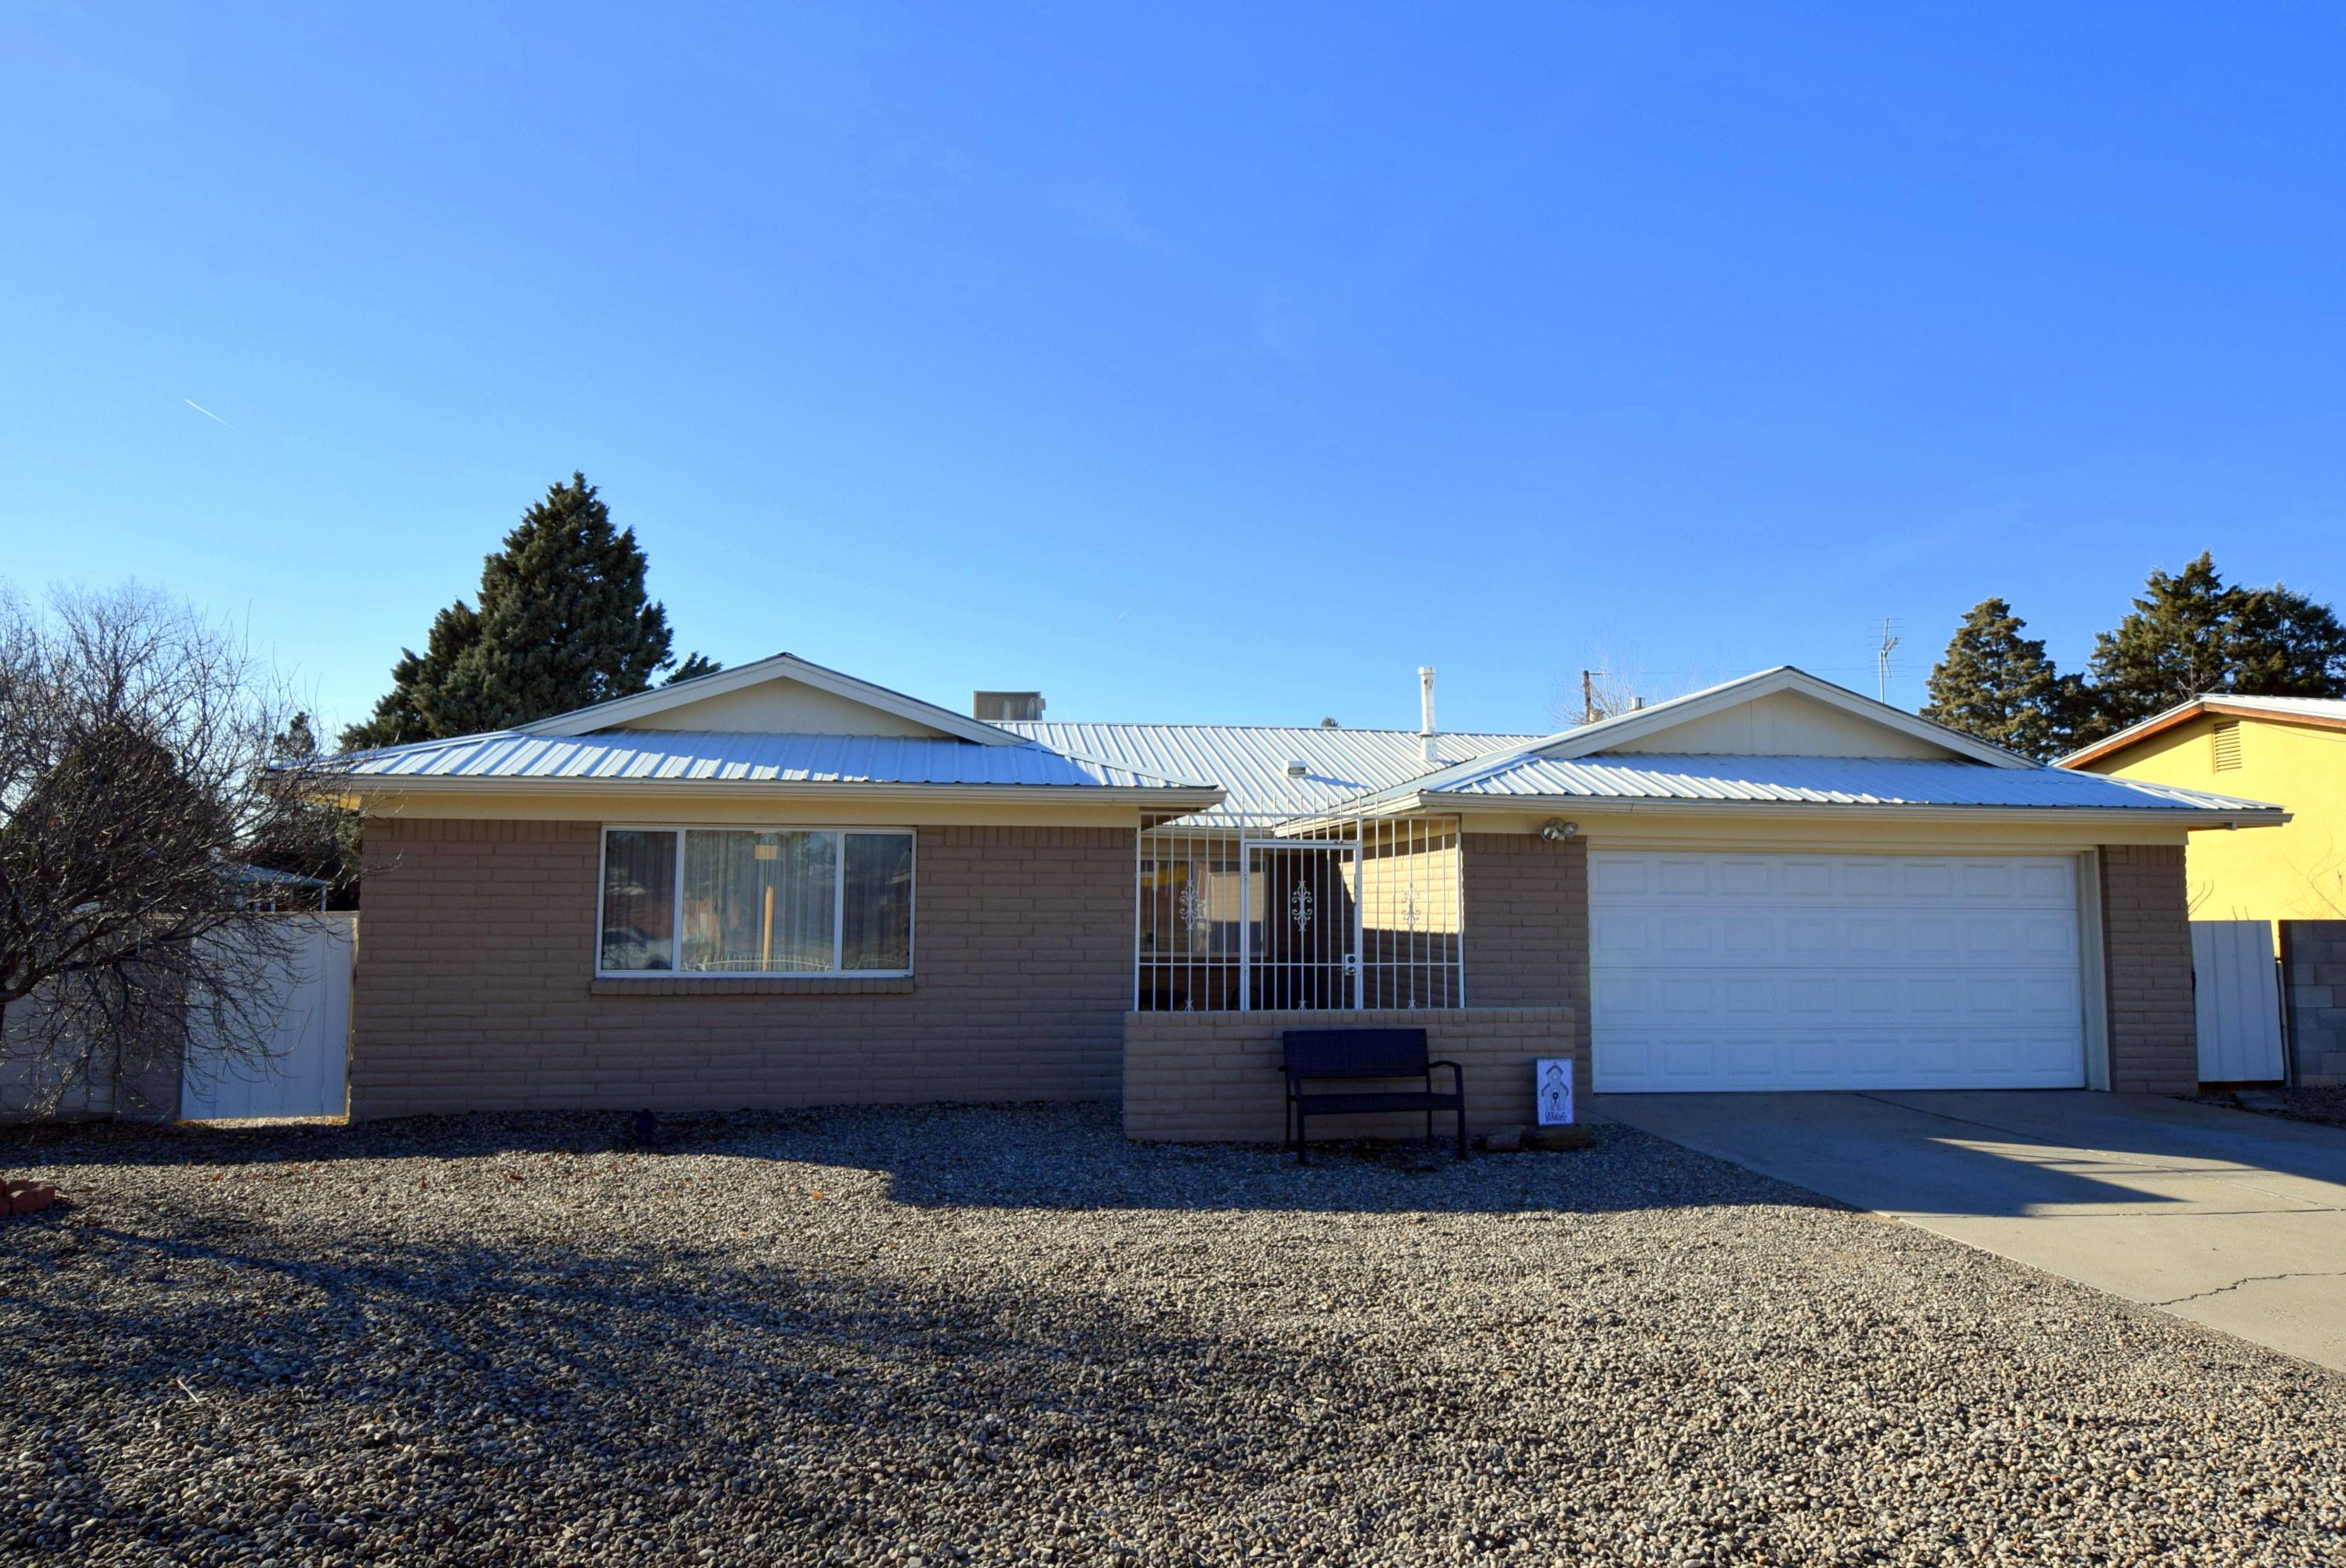 3101 SAN ISIDRO Street NW, Albuquerque, NM 87107 - Albuquerque, NM real estate listing